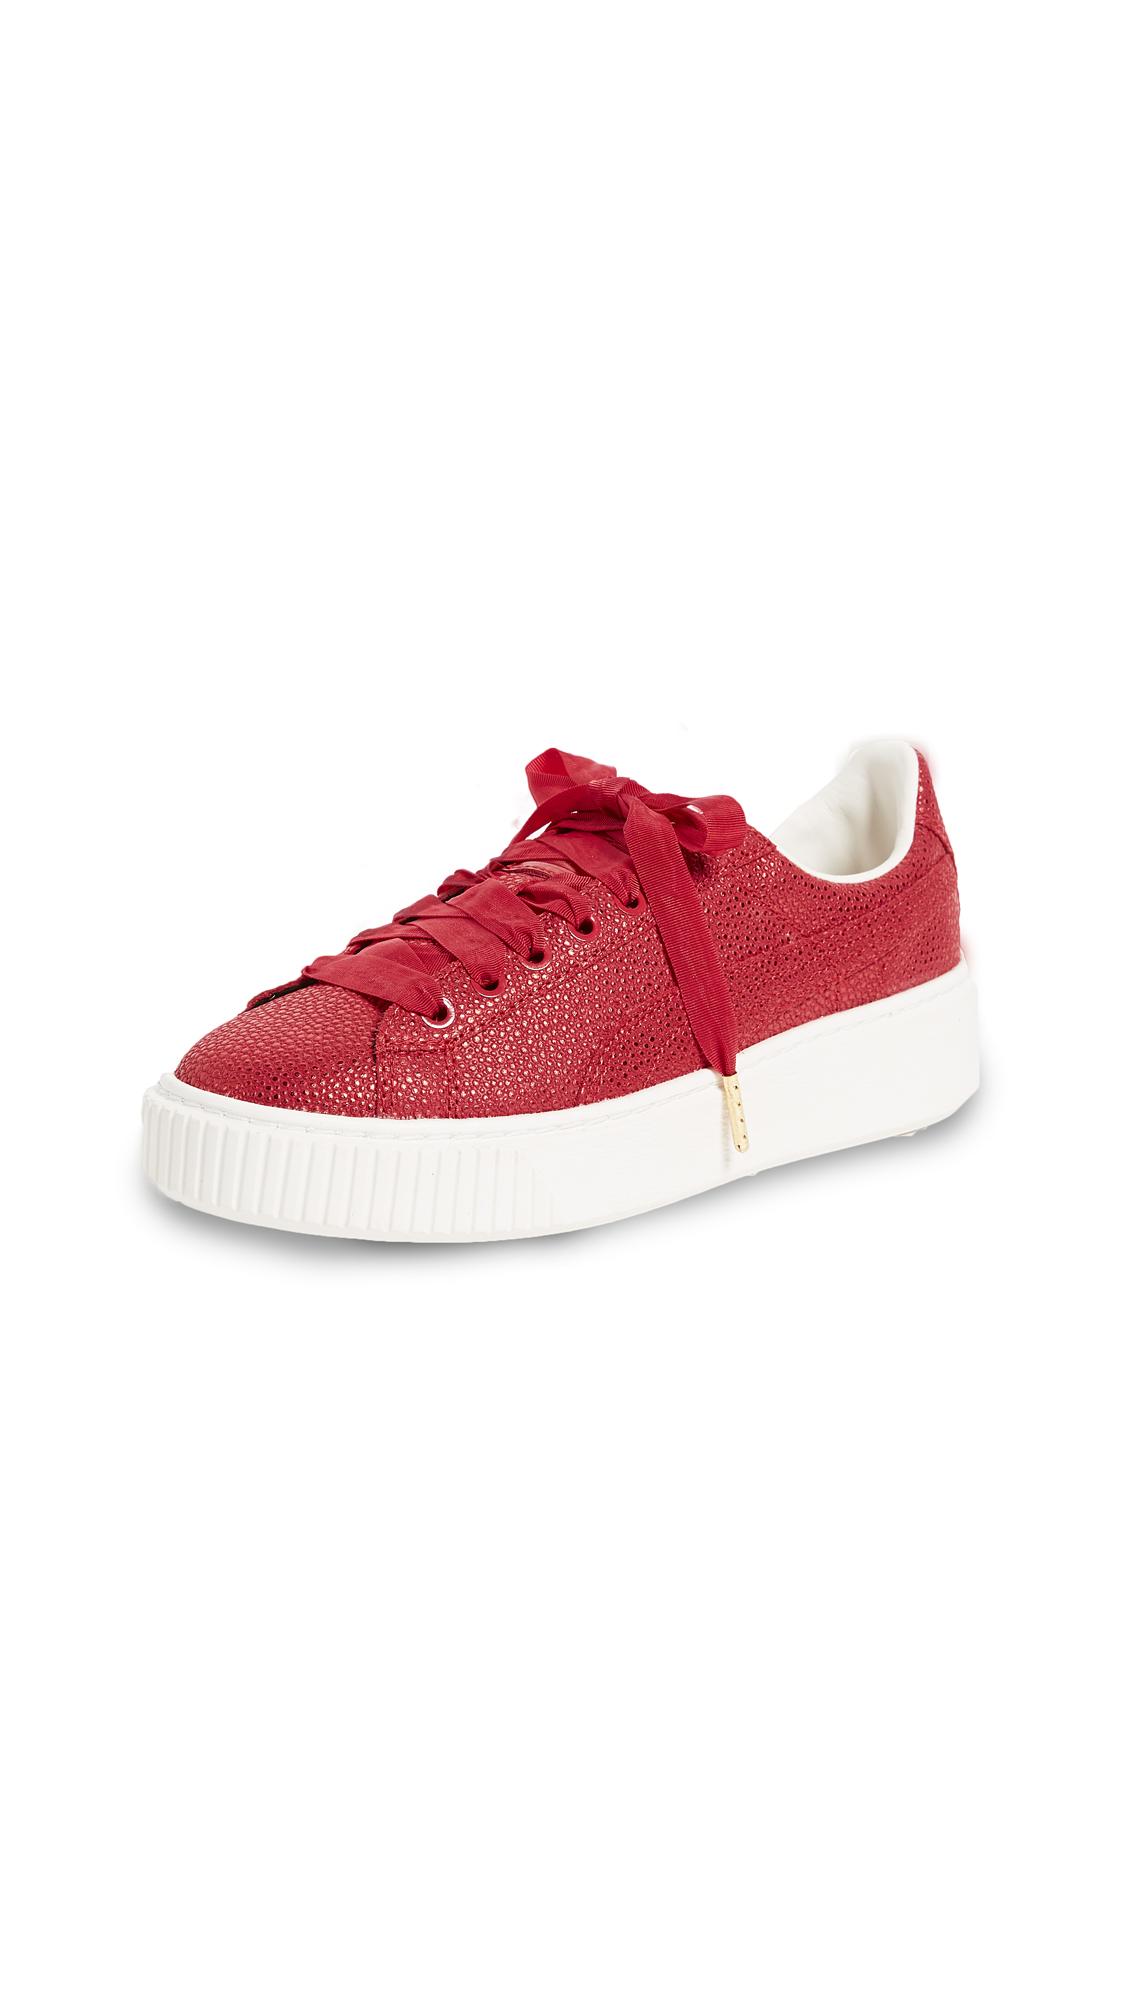 PUMA Basket Platform Lux Sneakers - Red